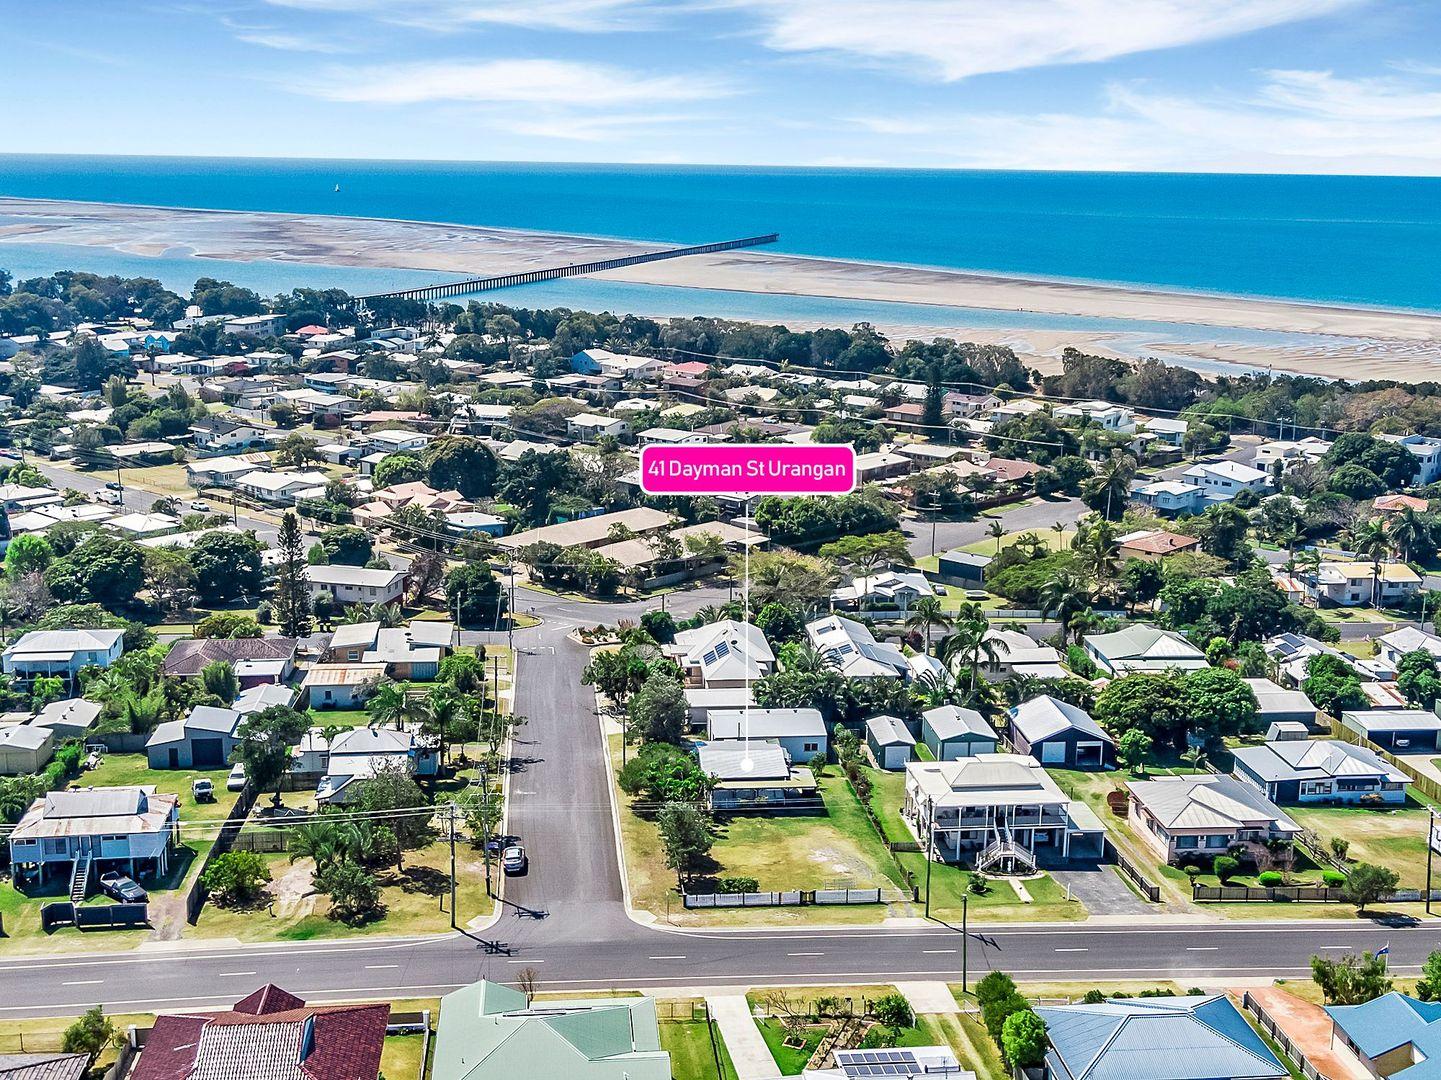 41 Dayman Street, Urangan QLD 4655, Image 0